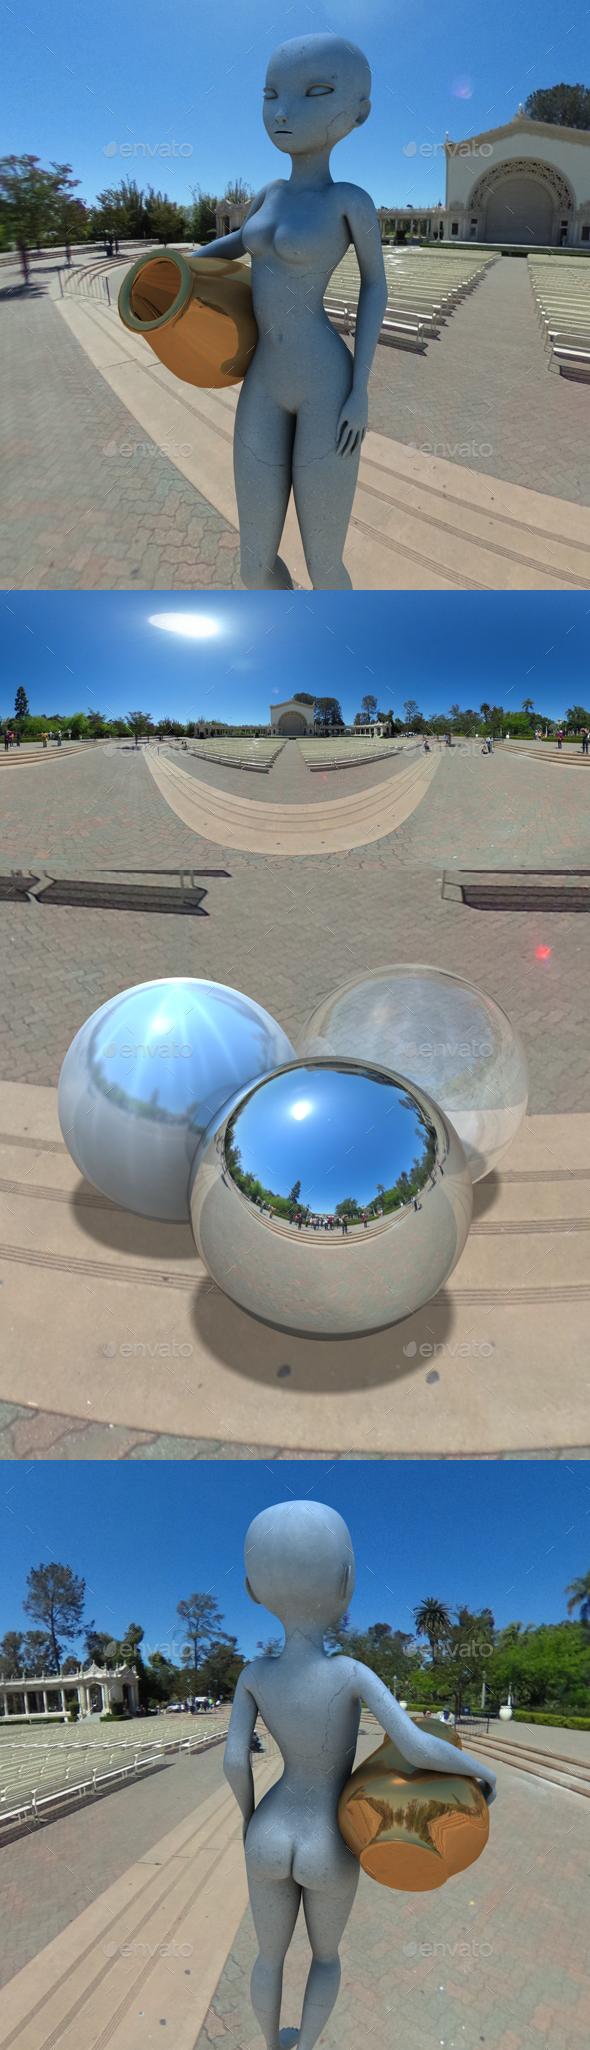 San Diego Balboa Park Pavillion HDRI